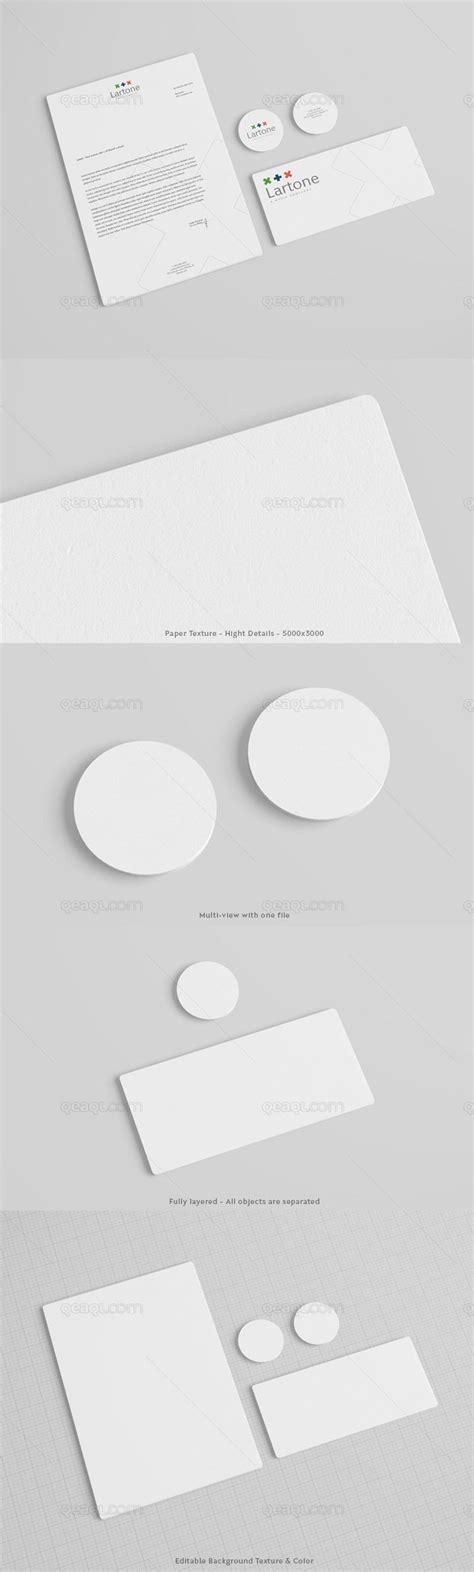 ideas   letterhead templates